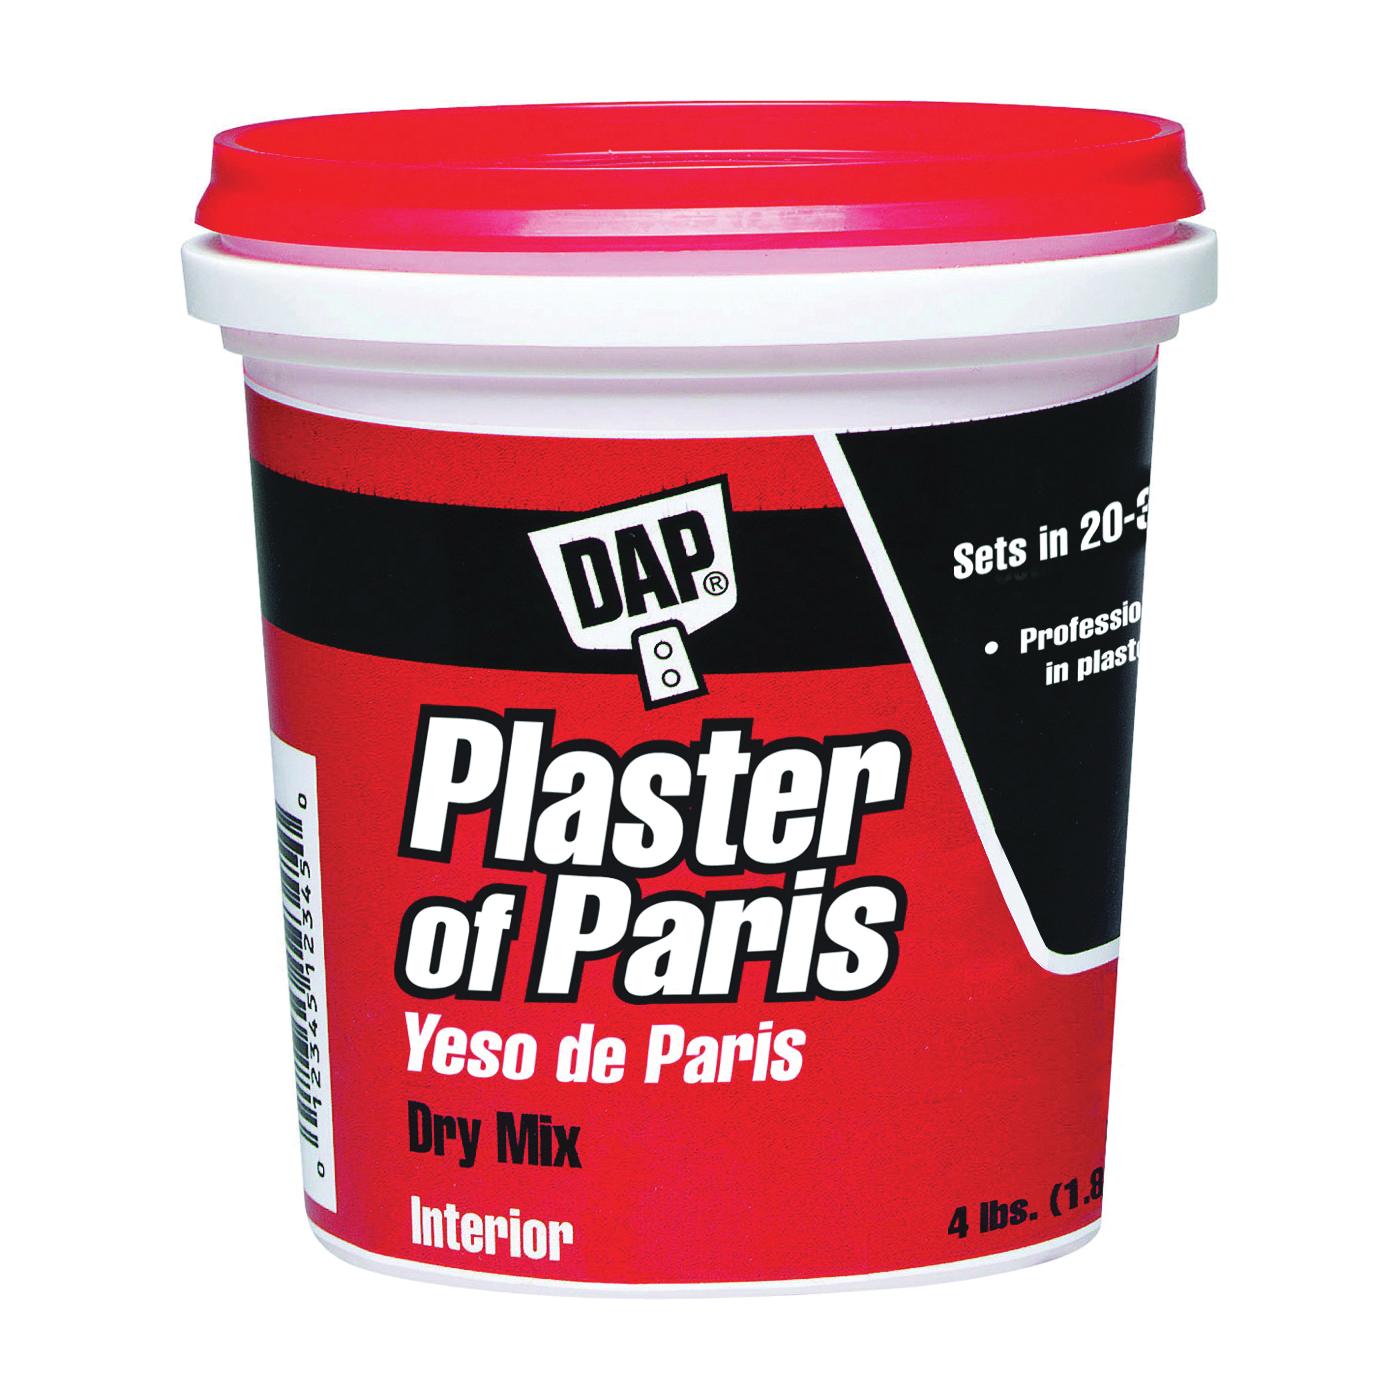 Picture of DAP 10308 Plaster of Paris, Powder, White, 4 lb Package, Tub